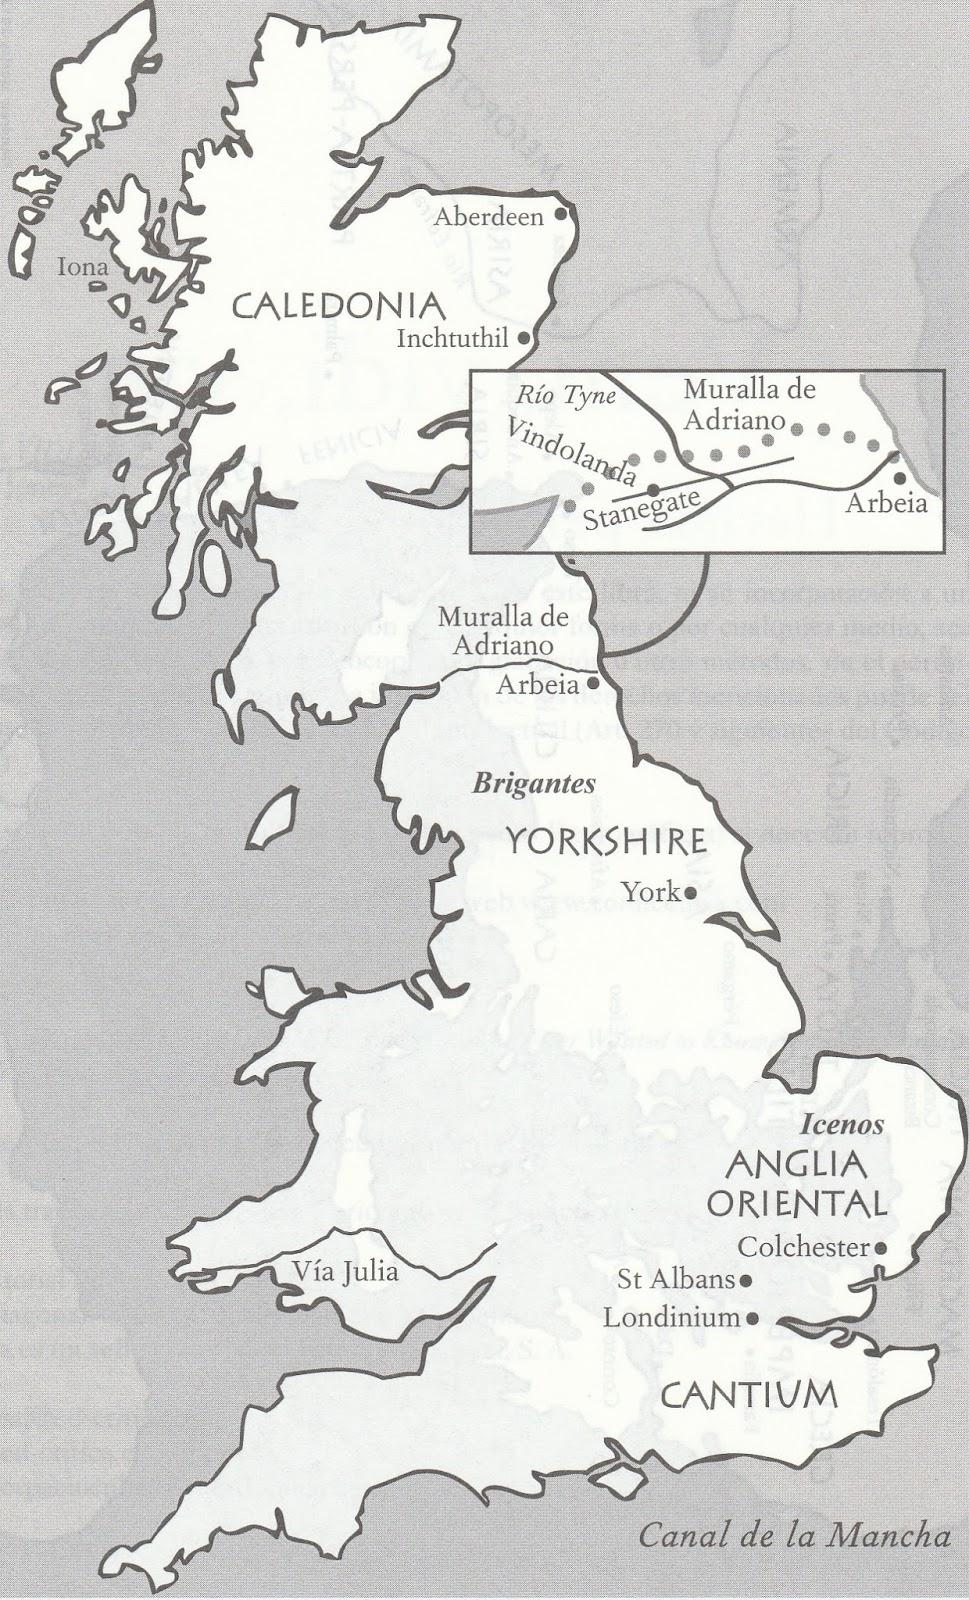 Muro De Adriano Mapa.Muro De Adriano Mapa Mapa